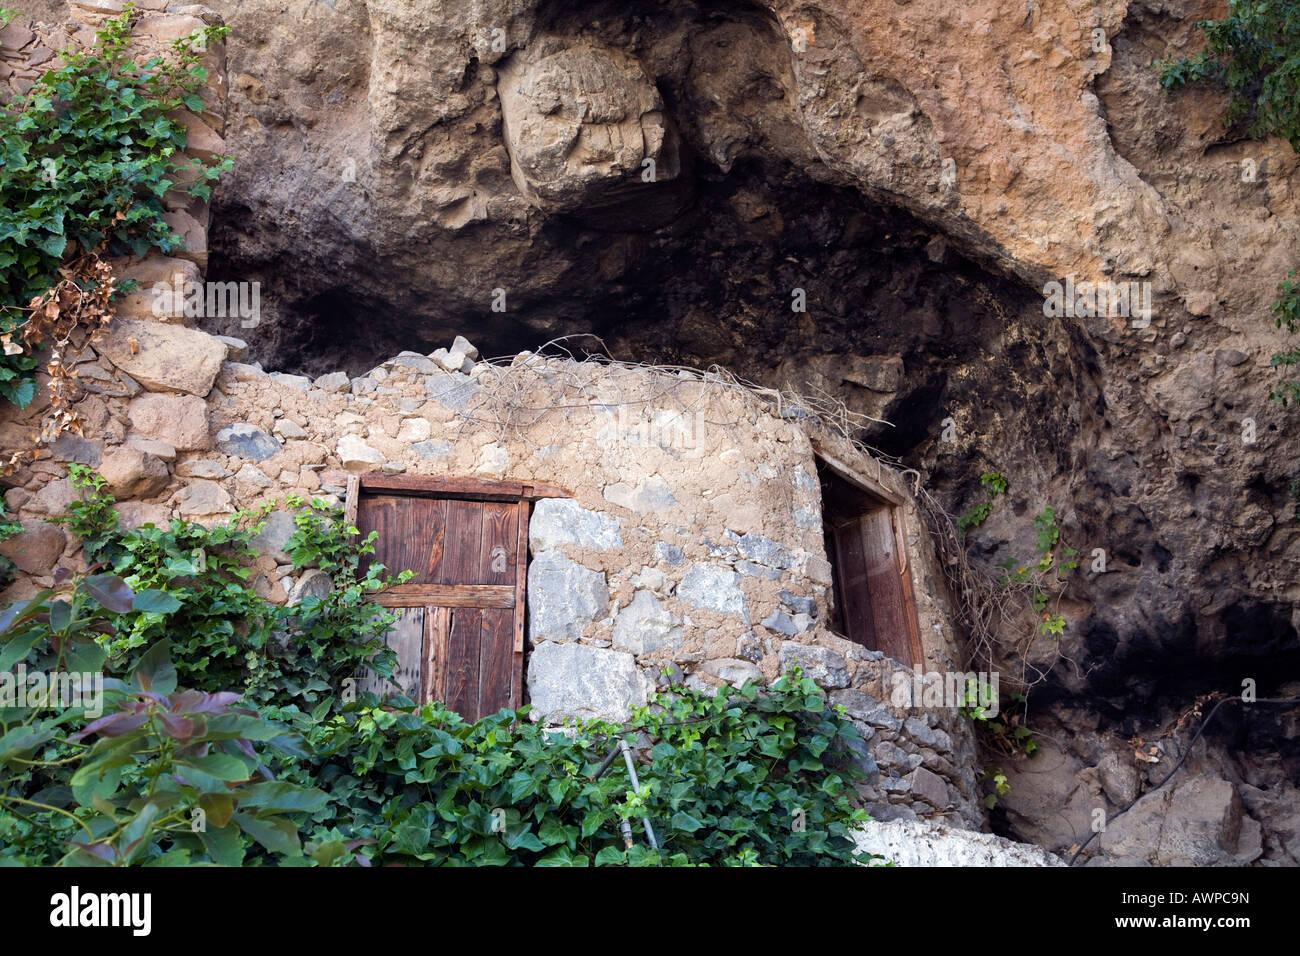 Entrance area of a monolithic home in La Coruna, Gran Canaria, Canary Islands, Spain, Europe Stock Photo